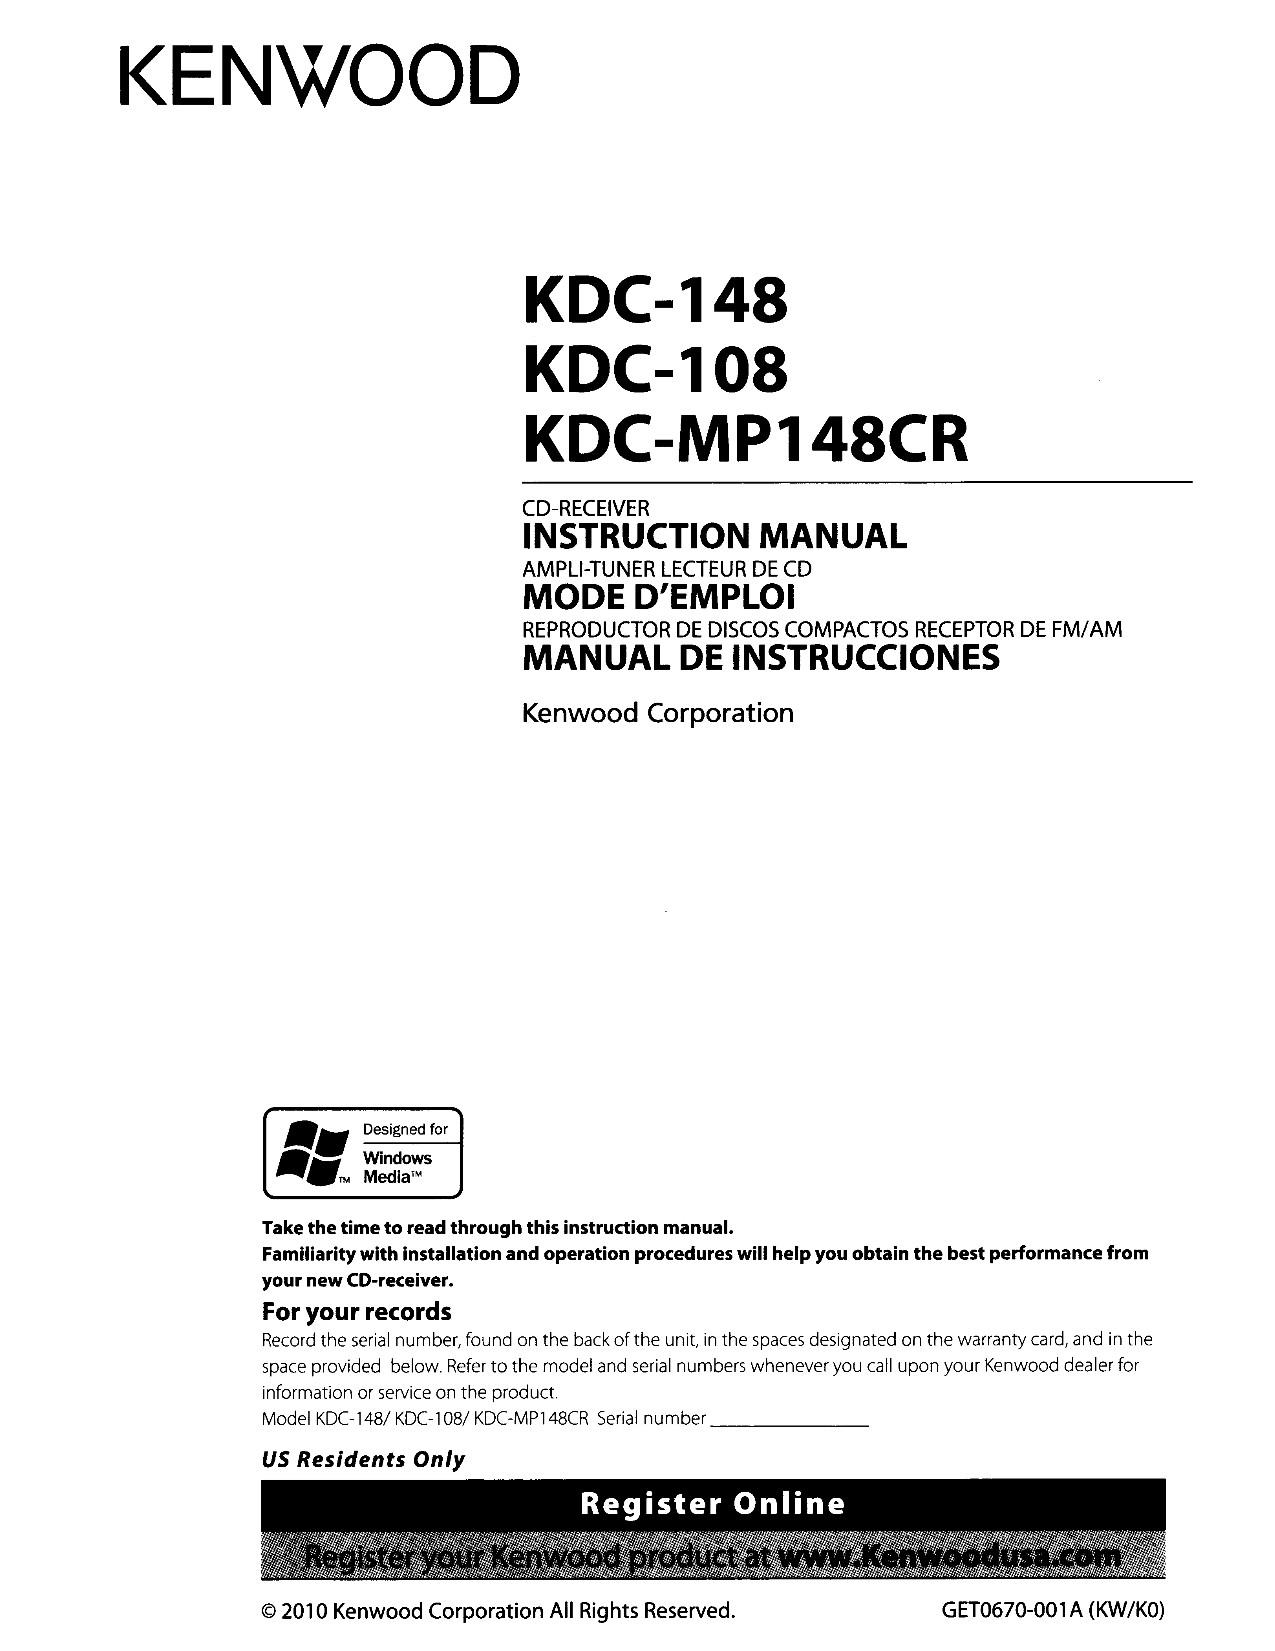 pdf for Kenwood Car Receiver KDC 148 manual